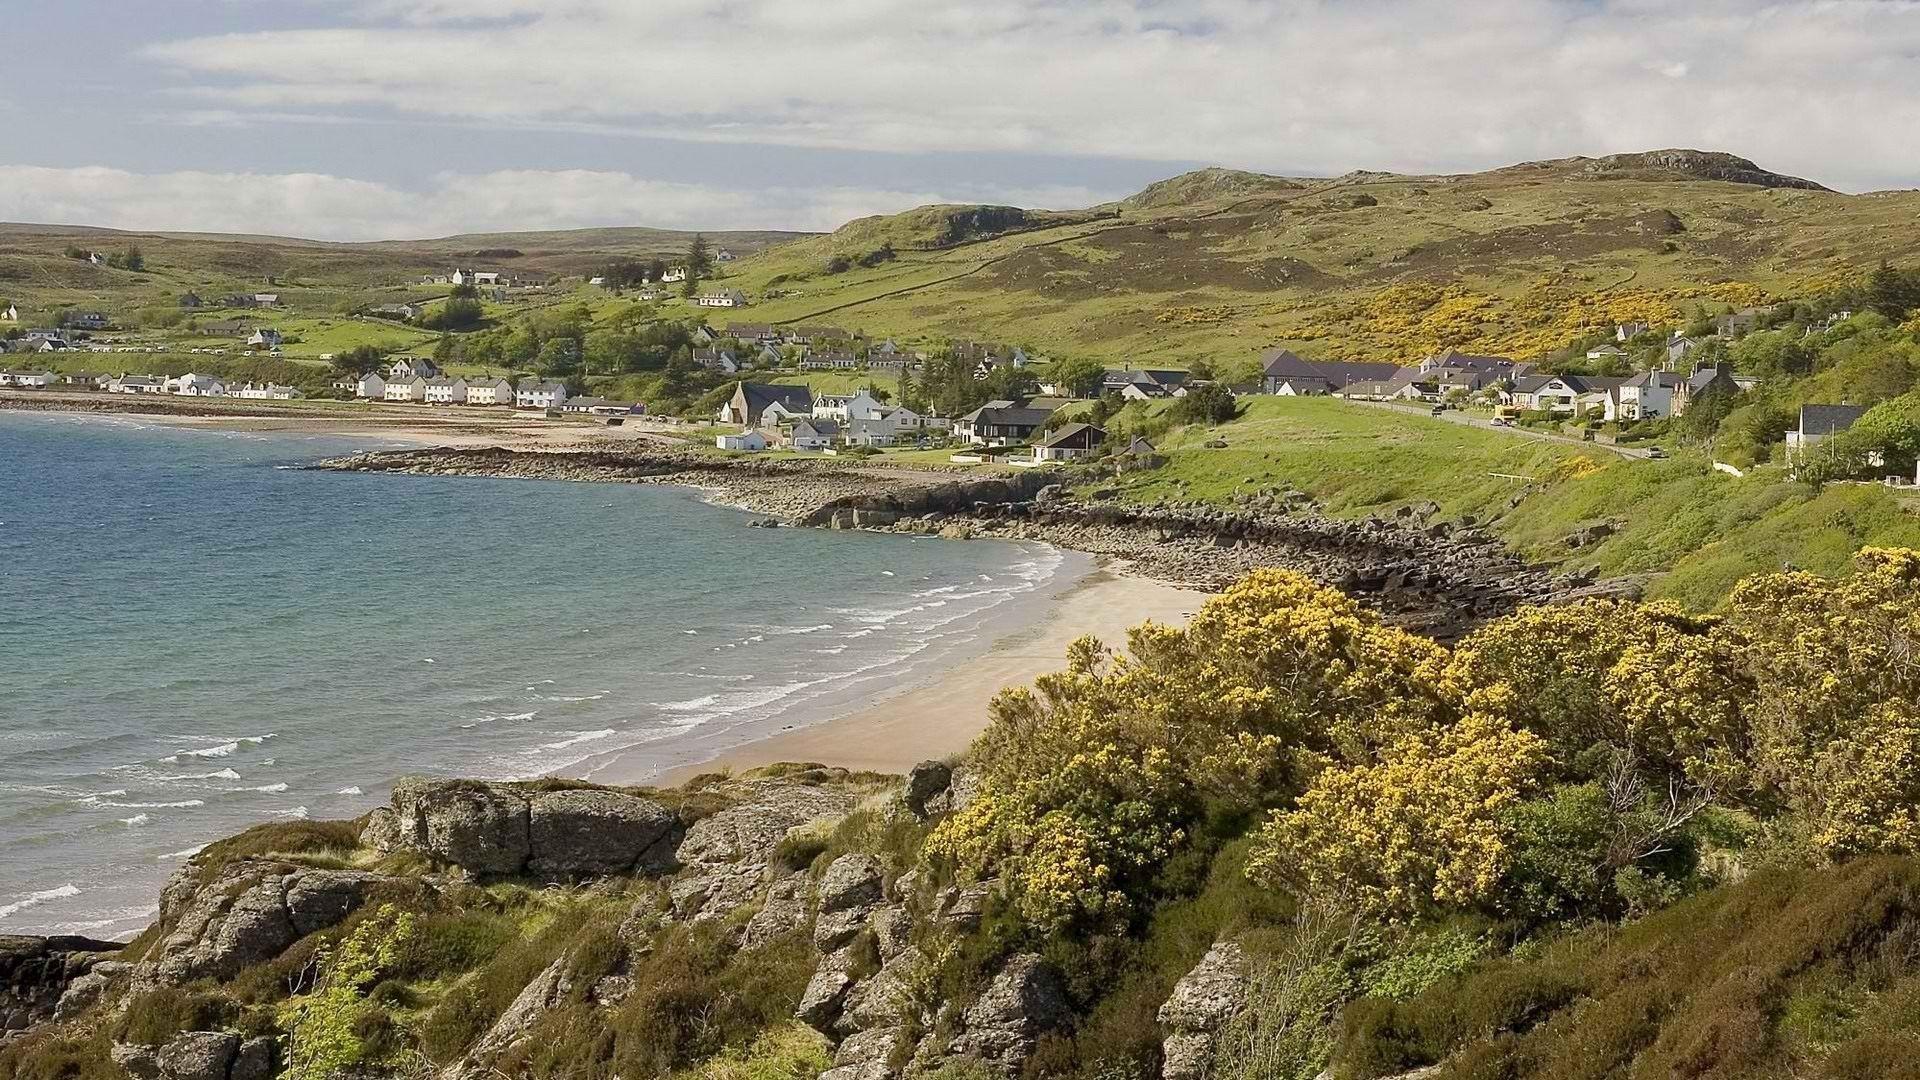 Xinaturecom Landscapes Sea Beach Rocks Wonderful Scotland